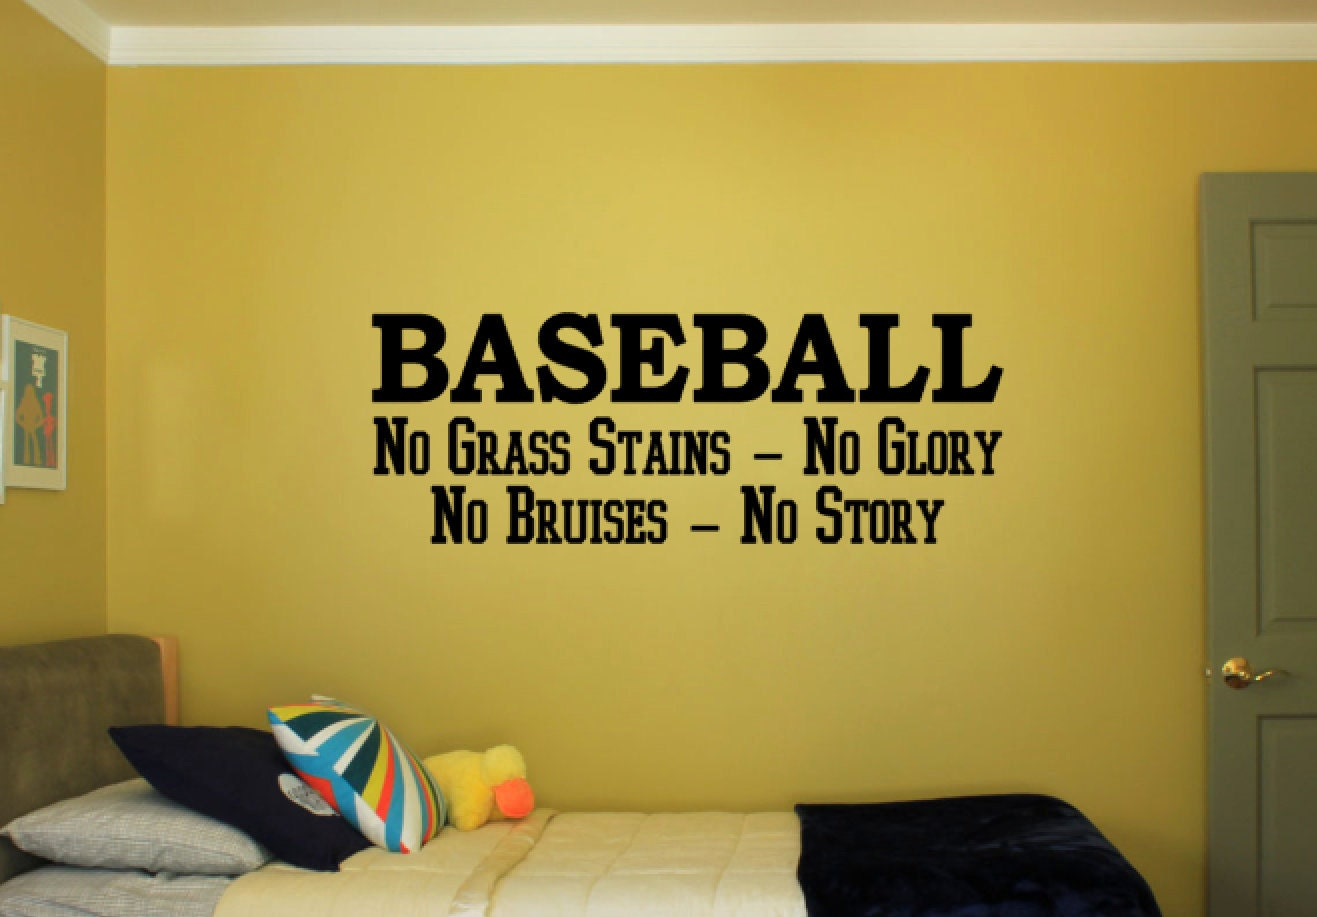 Baseball No Grass Stains No Glory No Bruises No Story - Vinyl Decal ...